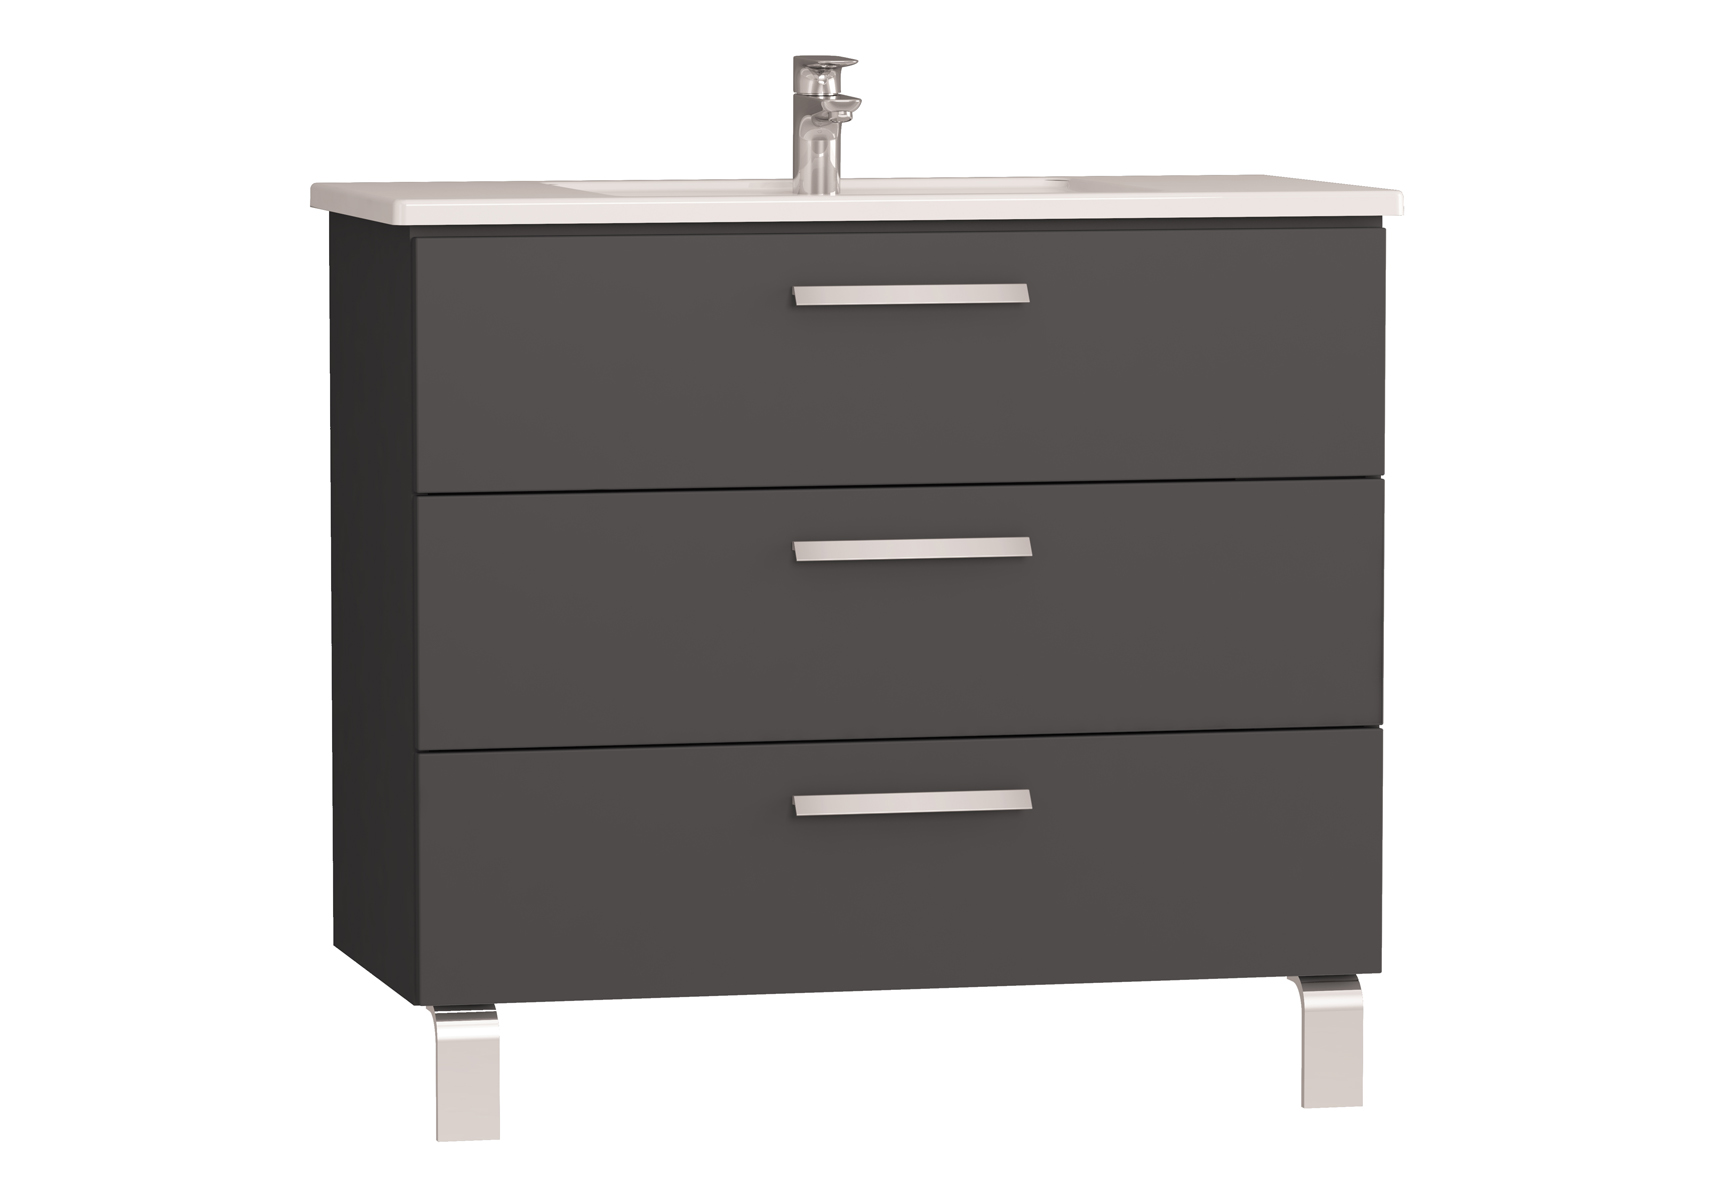 Integra meuble avec plan céramique avec trois tiroirs, 100 cm, anthraciteacite haute brillance